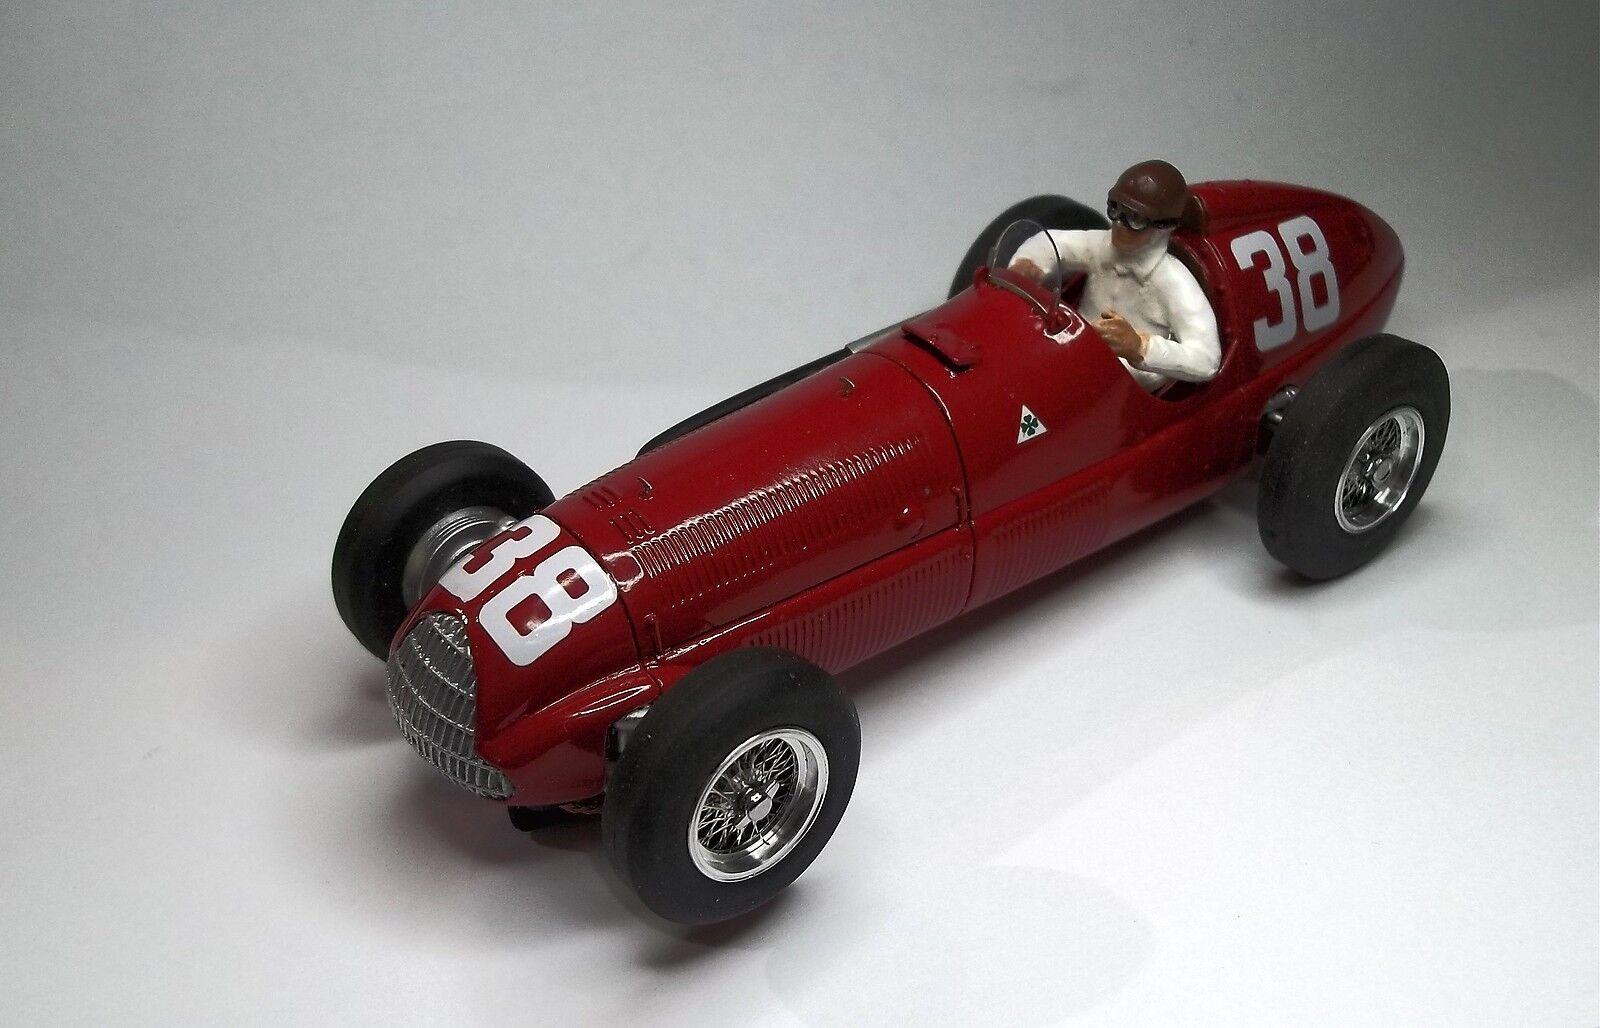 Probuild GTM stot voiture ALFA ROMEO ALFETTA 158 VImille GP RTR #38 VImille 158 1947 suisses 1st b265dc